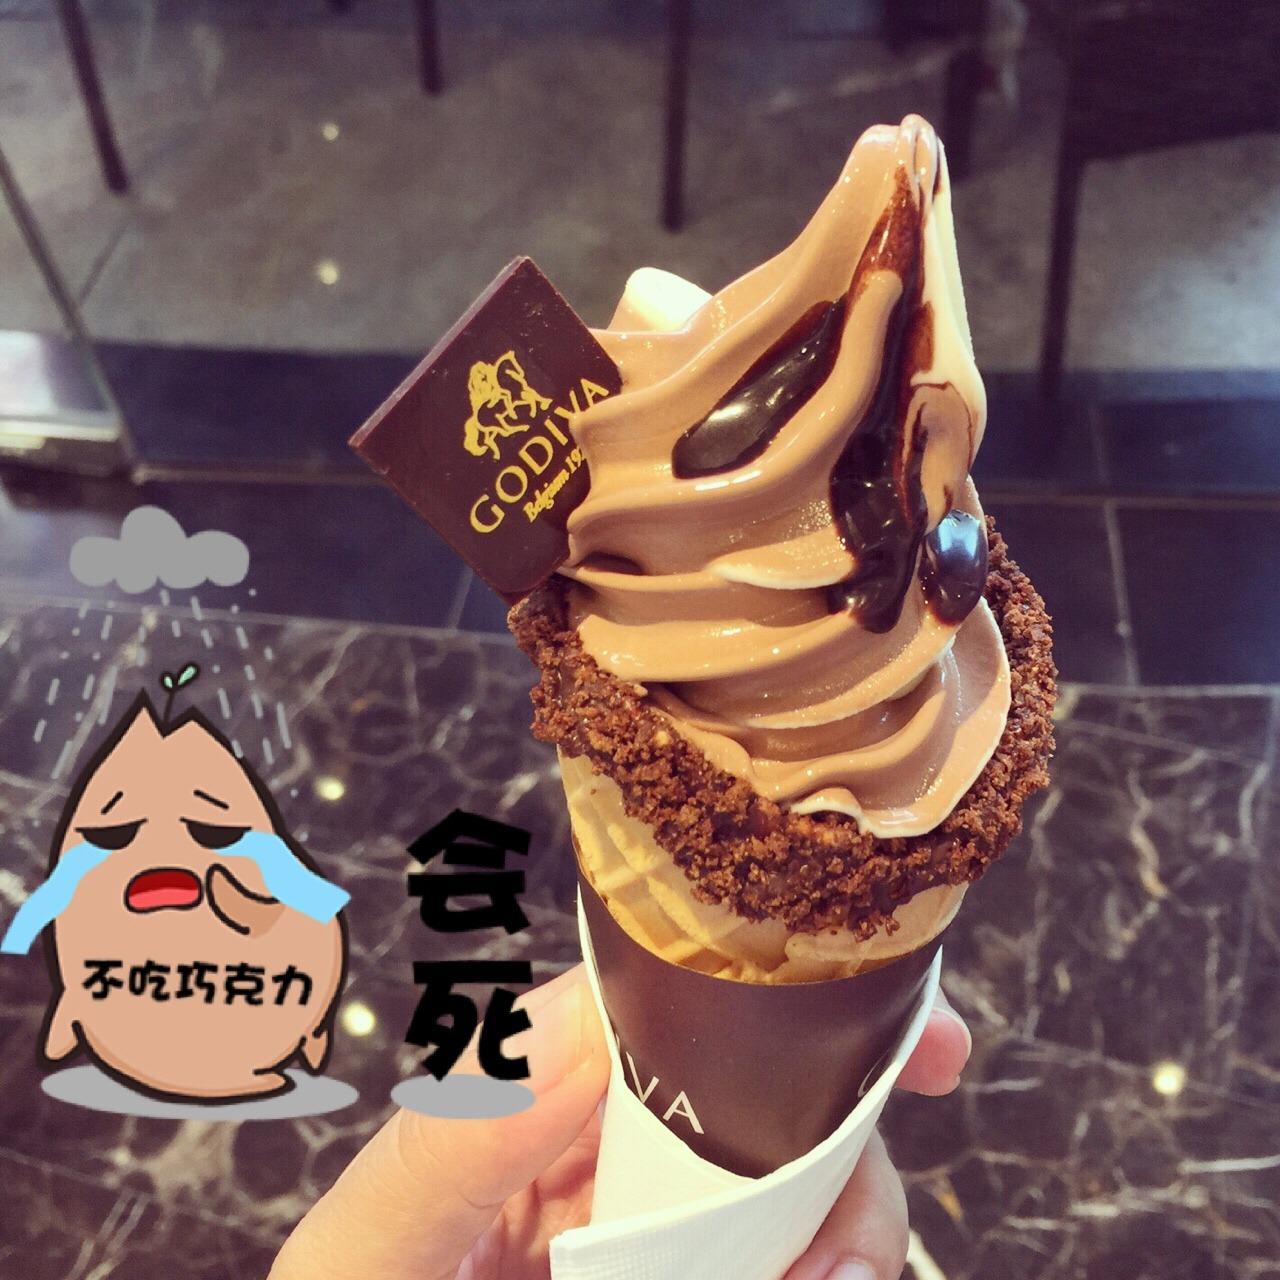 godiva甜筒冰淇淋[哈哈]